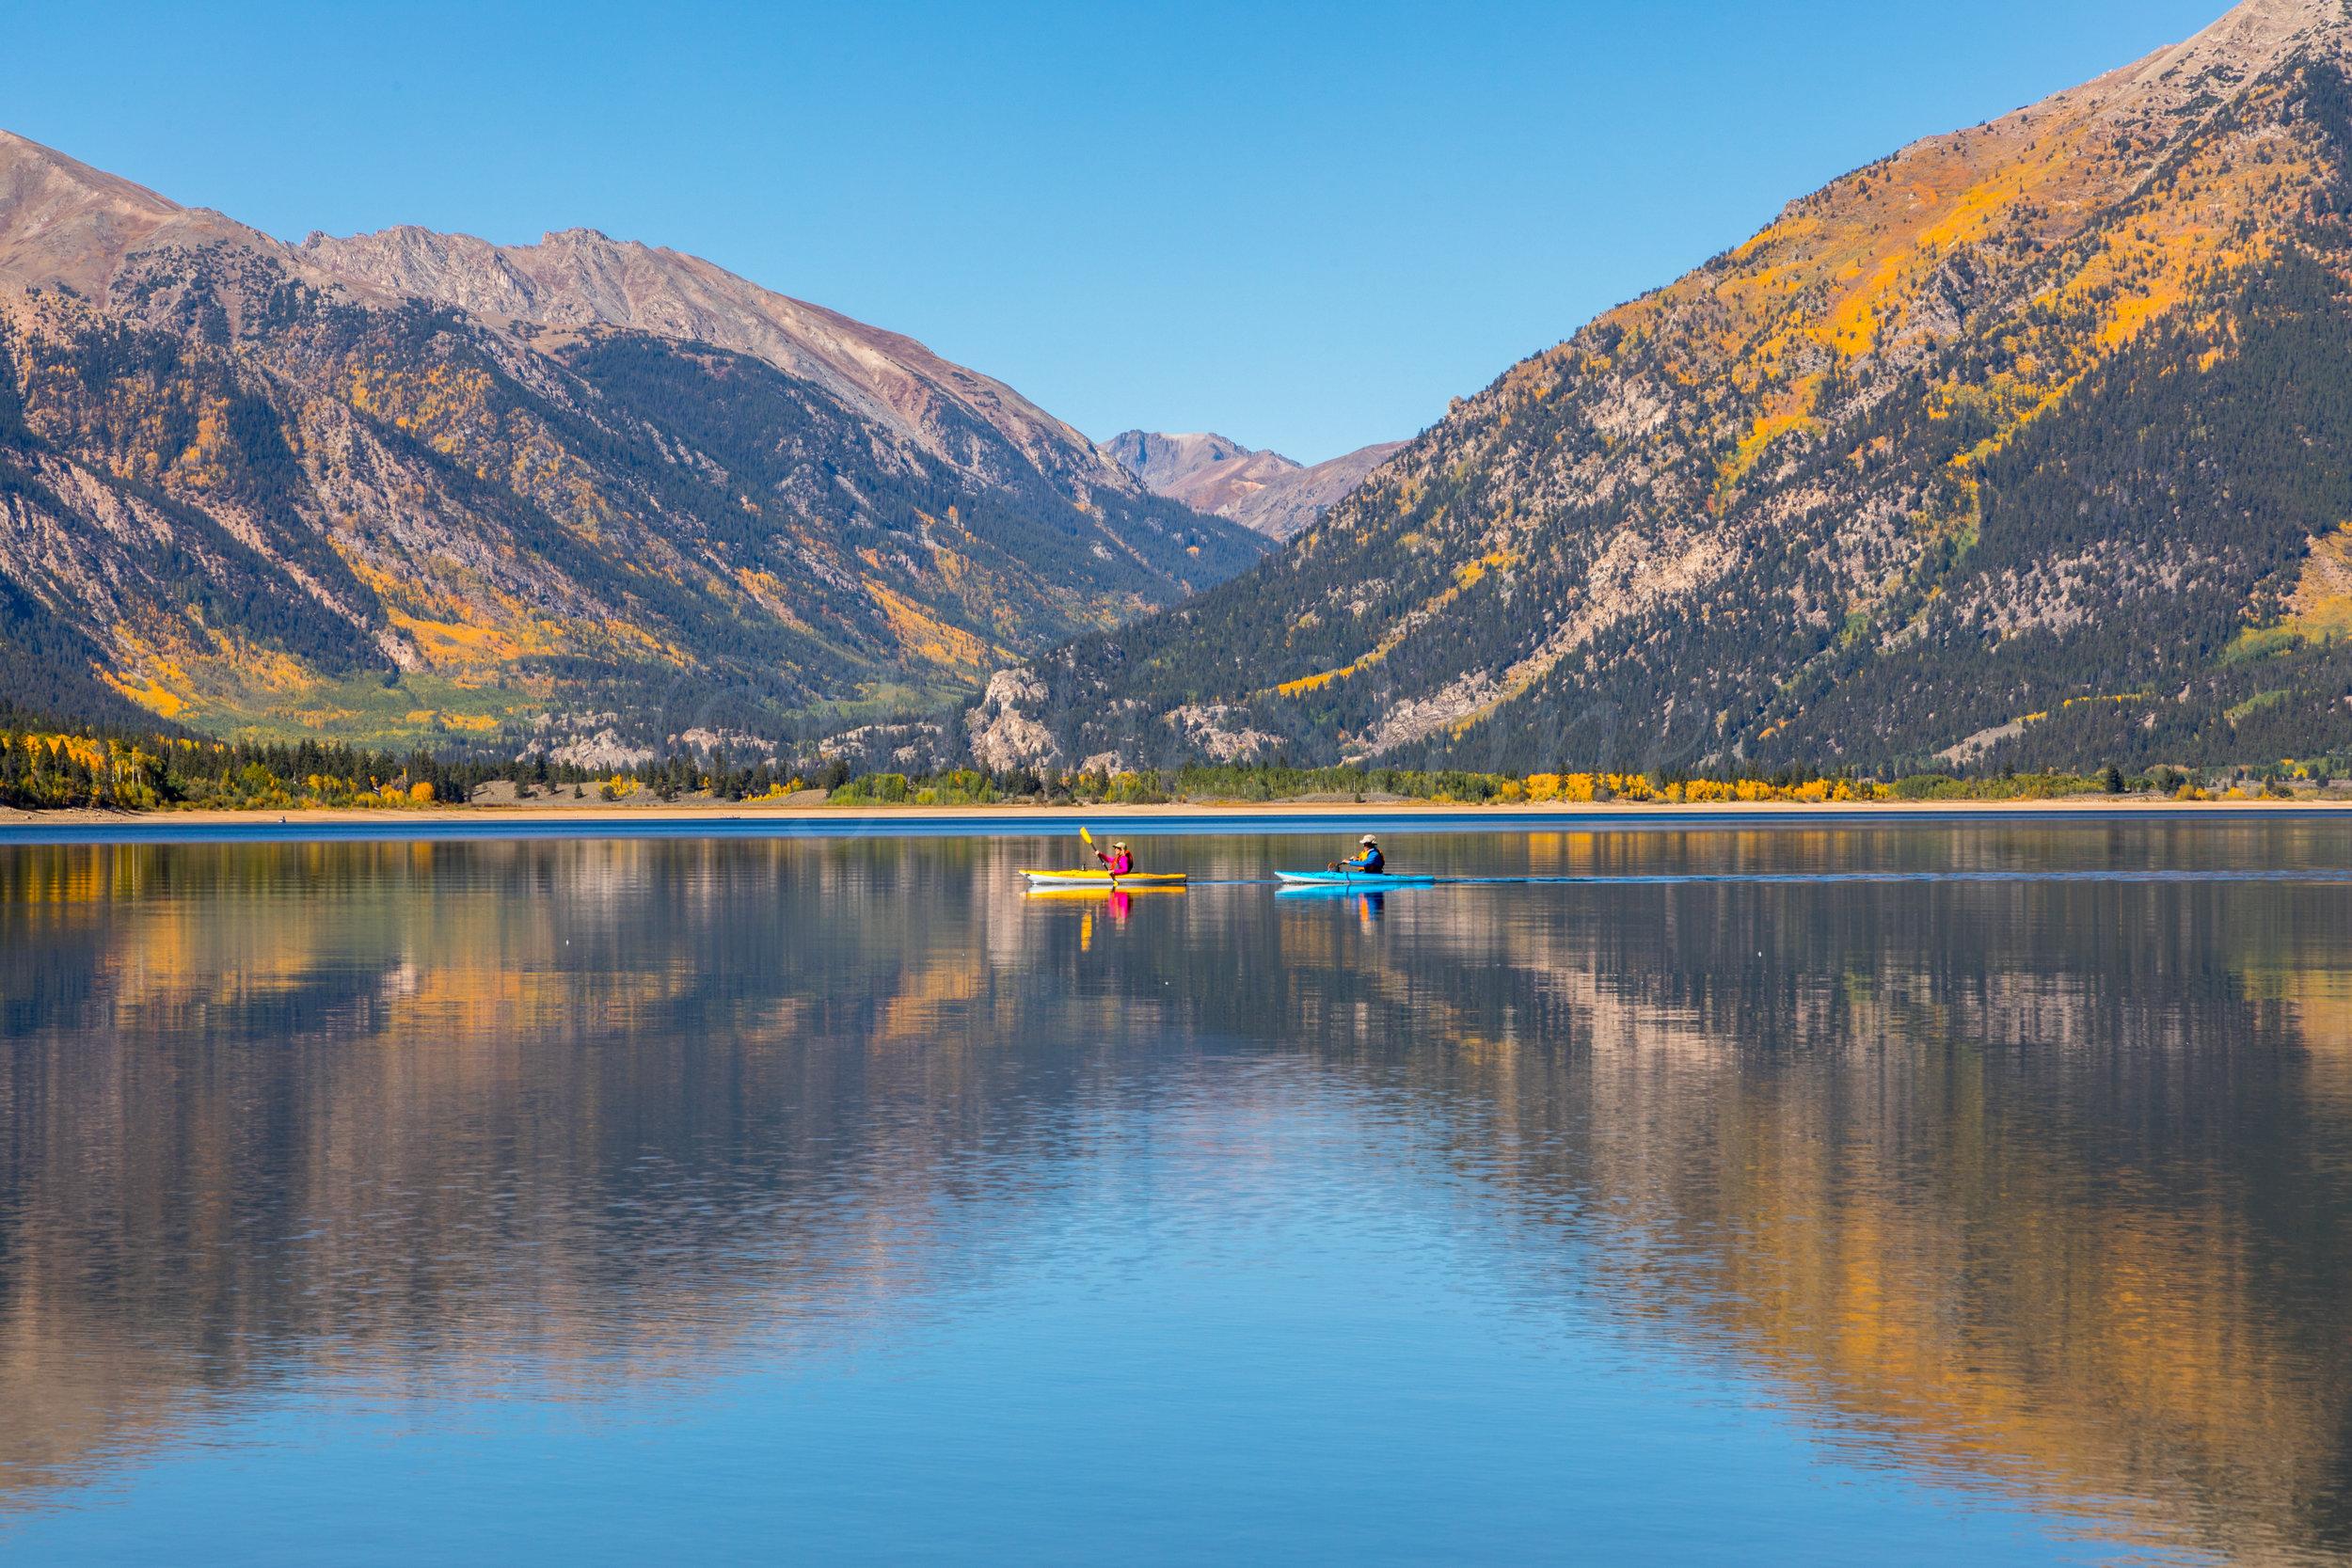 Twin Lakes, Image # 0506